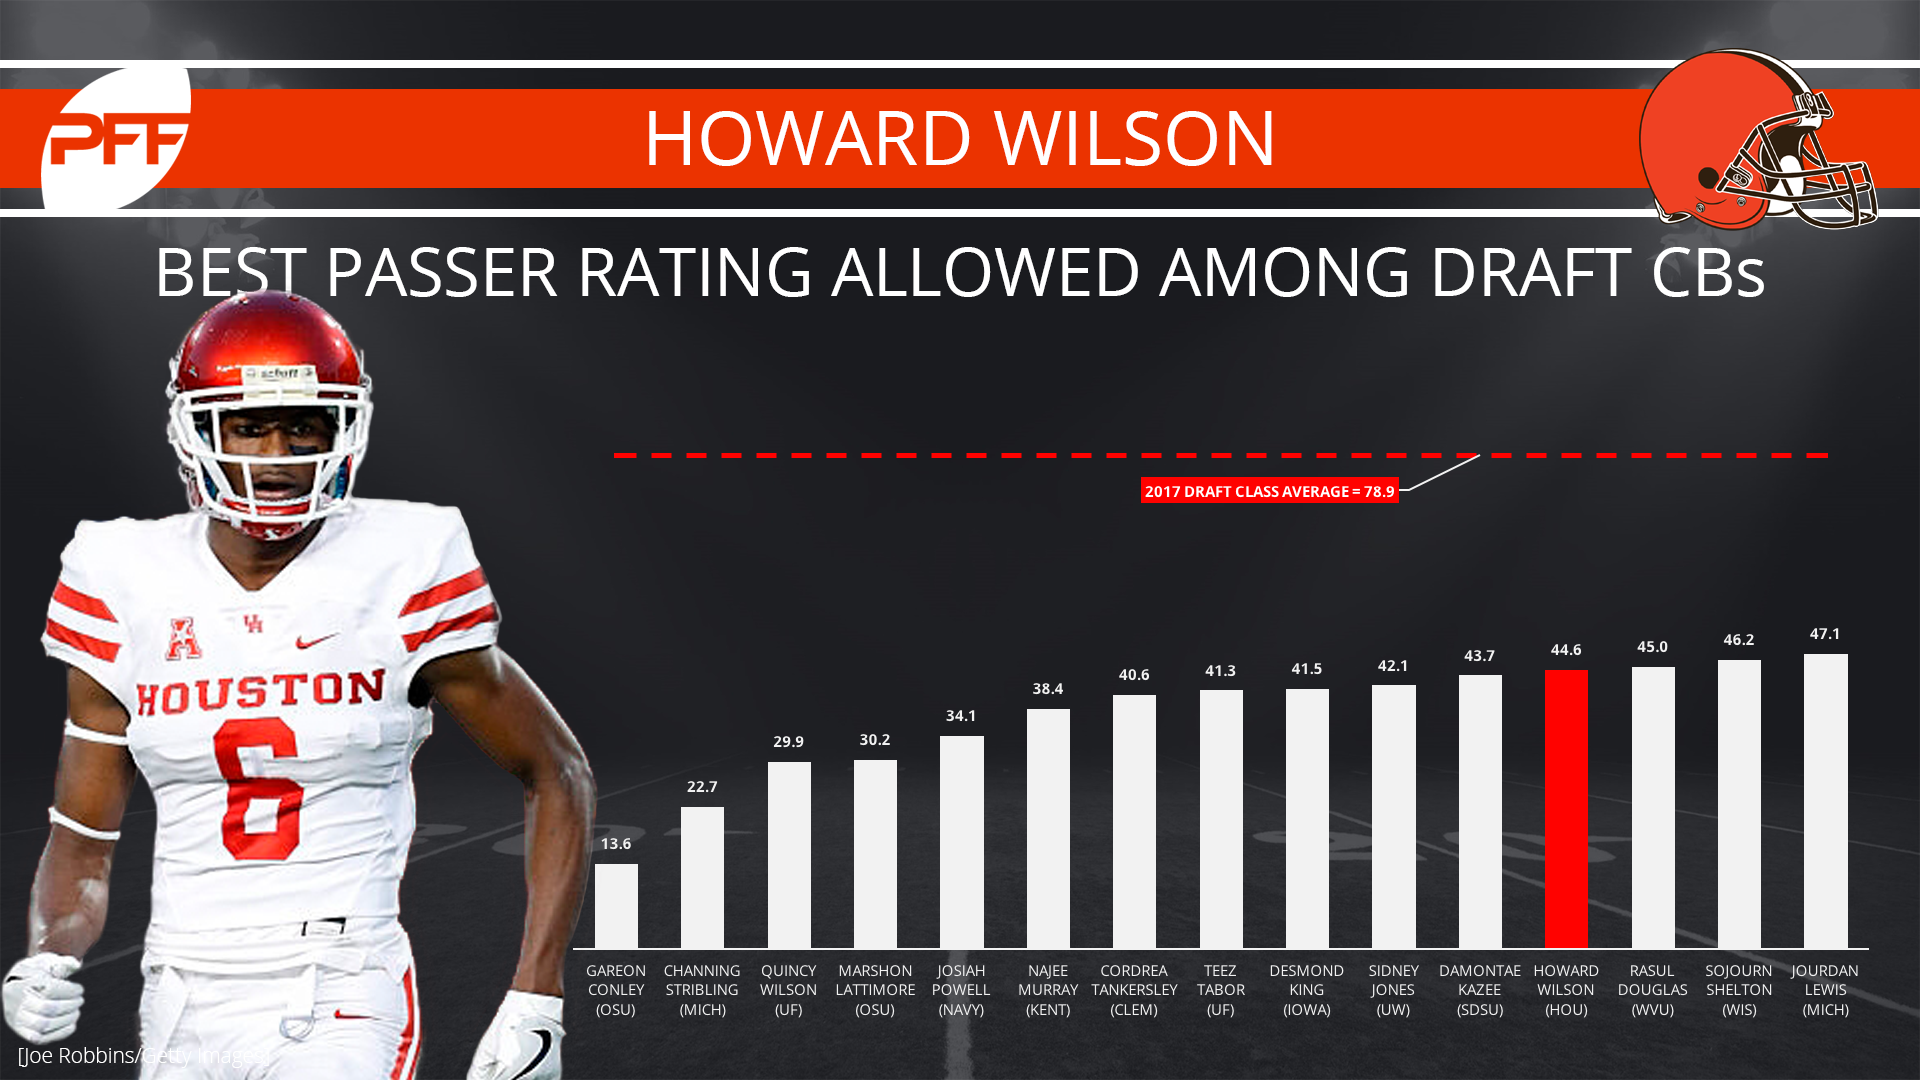 Howard Wilson